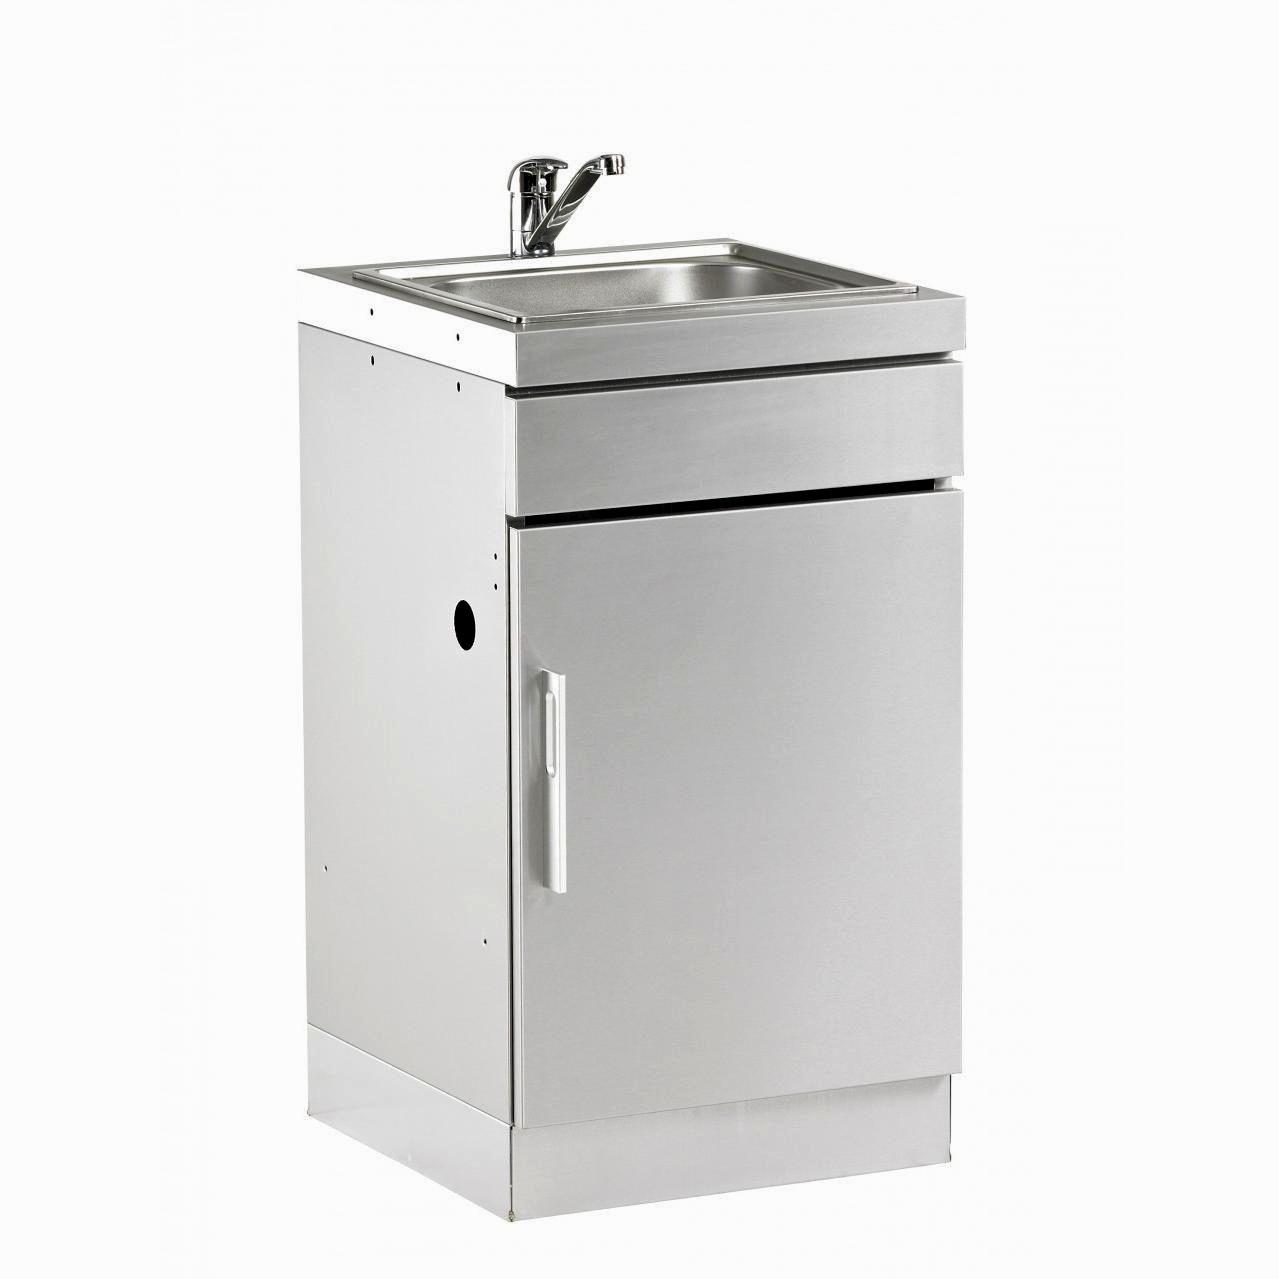 best double sink bathroom vanity architecture-Excellent Double Sink Bathroom Vanity Décor